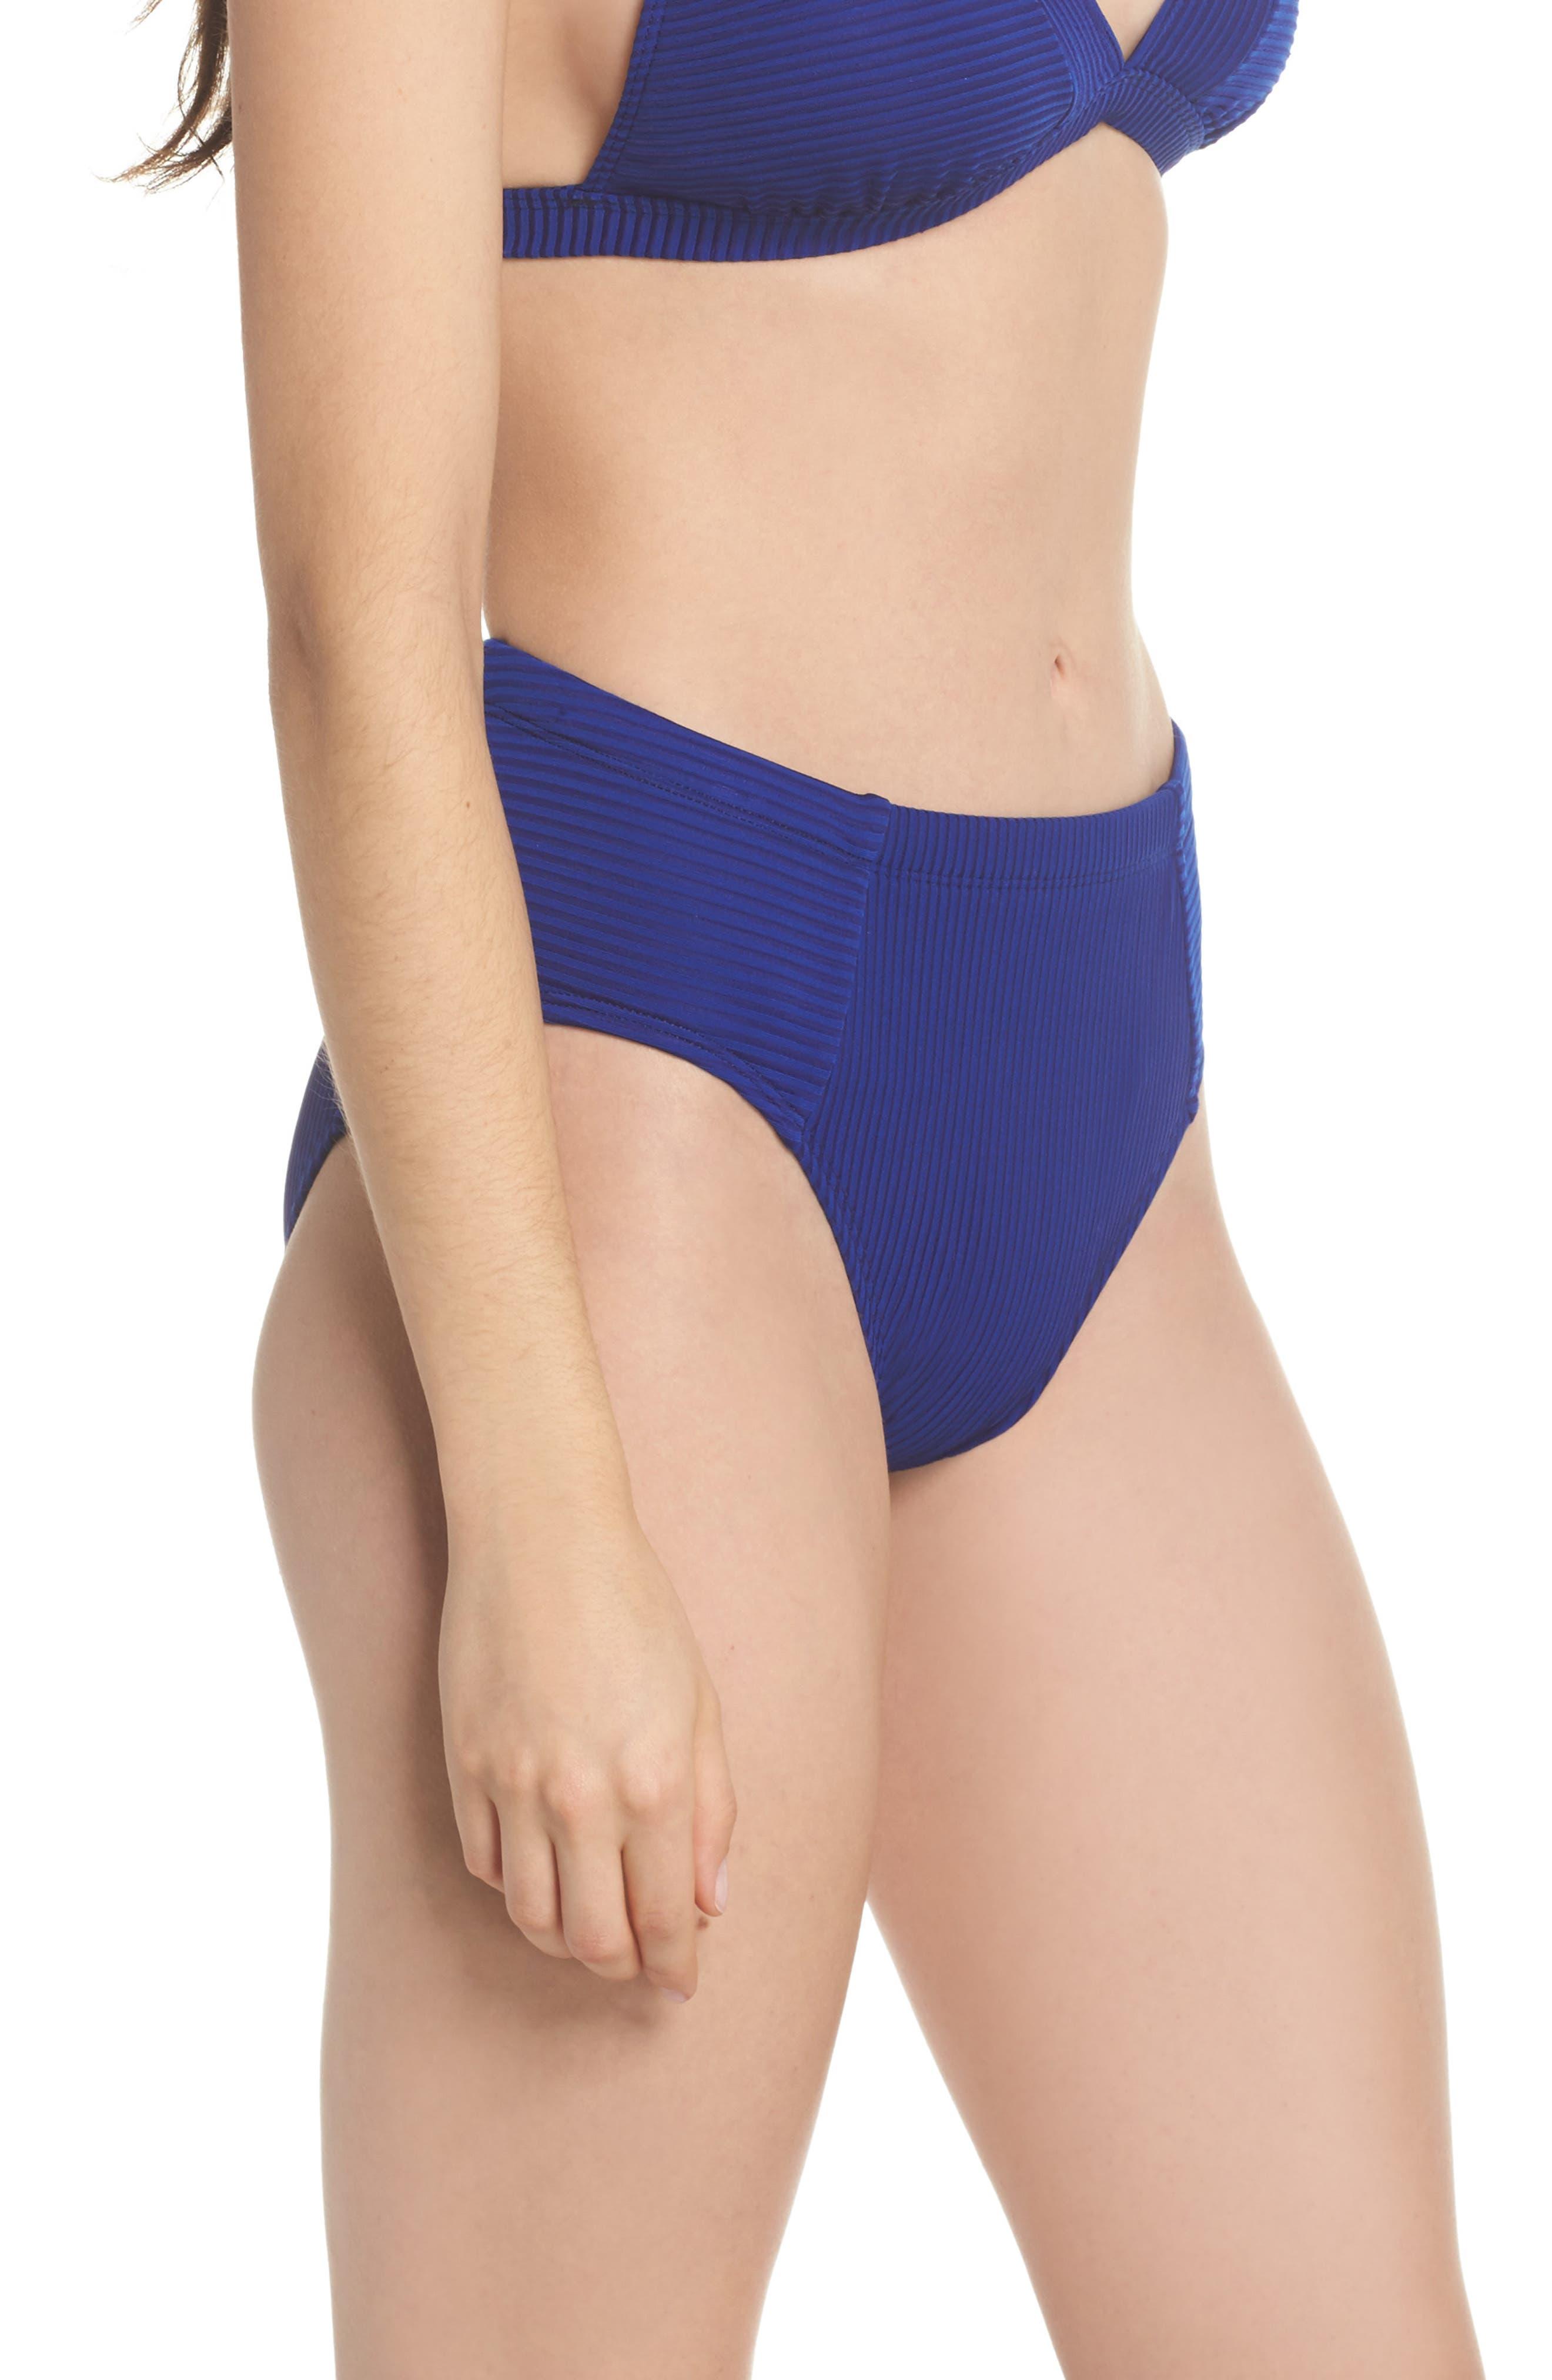 Becca High Waist Bikini Bottoms,                             Alternate thumbnail 3, color,                             Apollo Blue